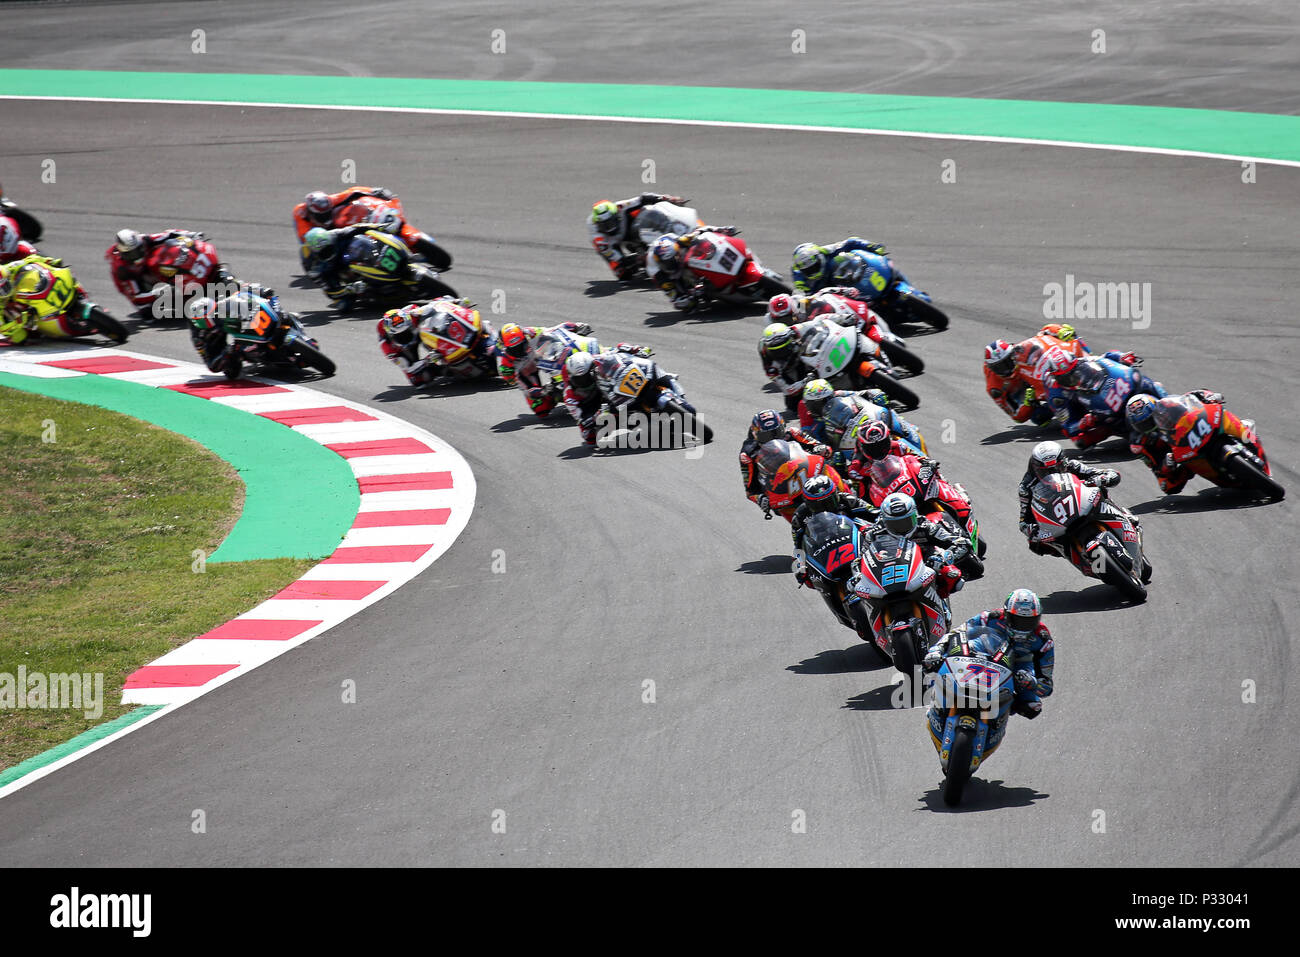 Barcelona -17th June 2018- SPAIN: start of the Moto 2 GP Catalunya Moto GP, in the Barcelona-Catalunya Circuit, on 17th June 2018. Photo: Joan Valls/Urbanandsport/Cordon Press - Stock Image